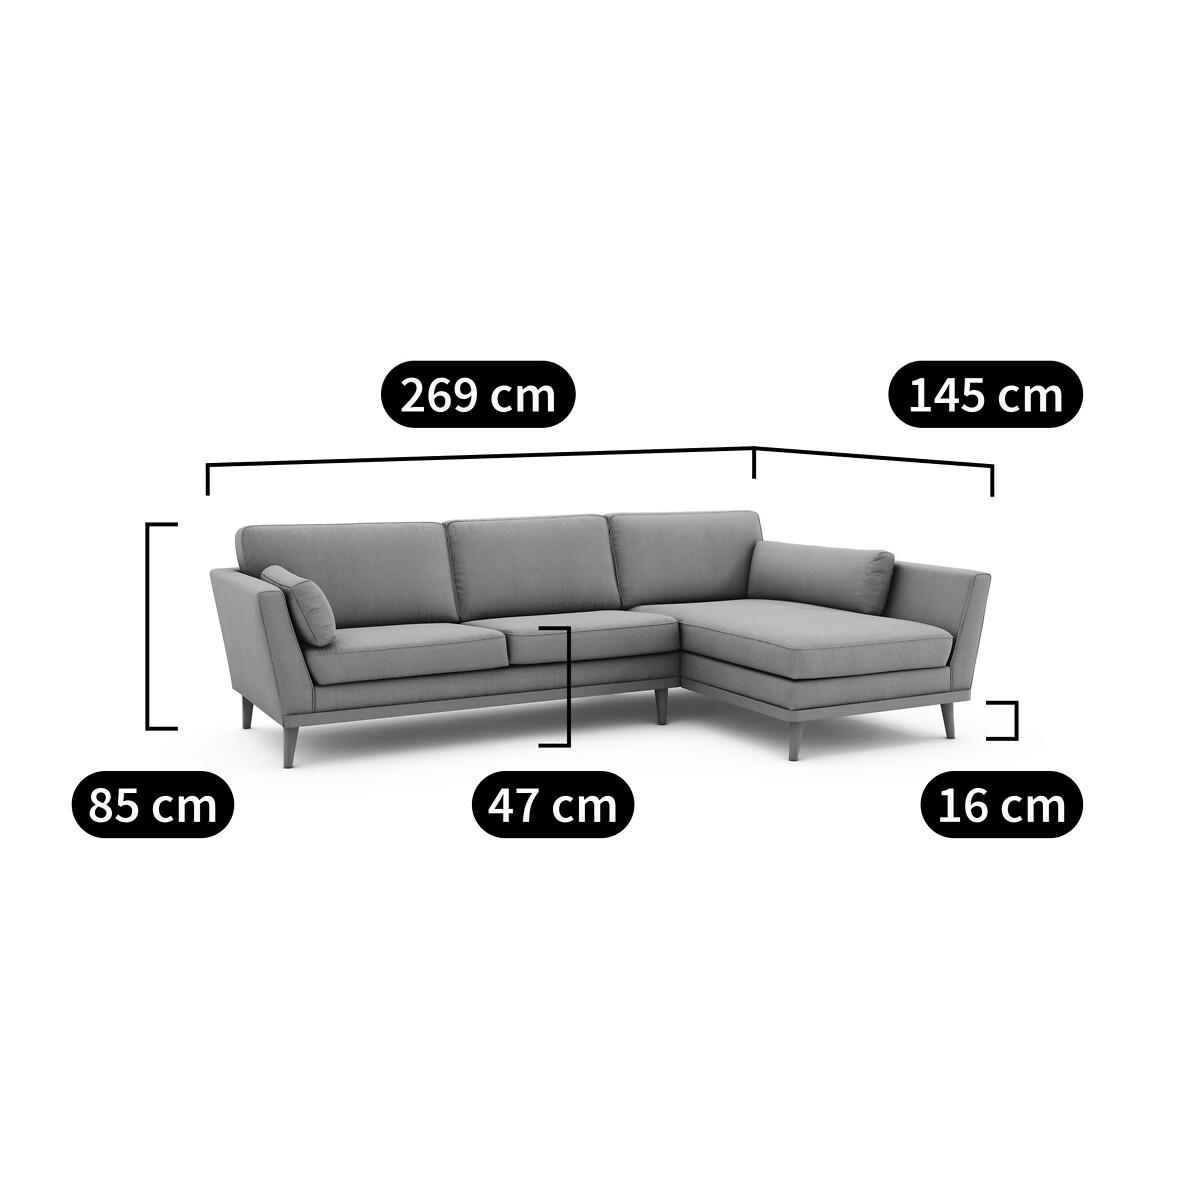 Canapé d'angle Tissu Scandinave Confort